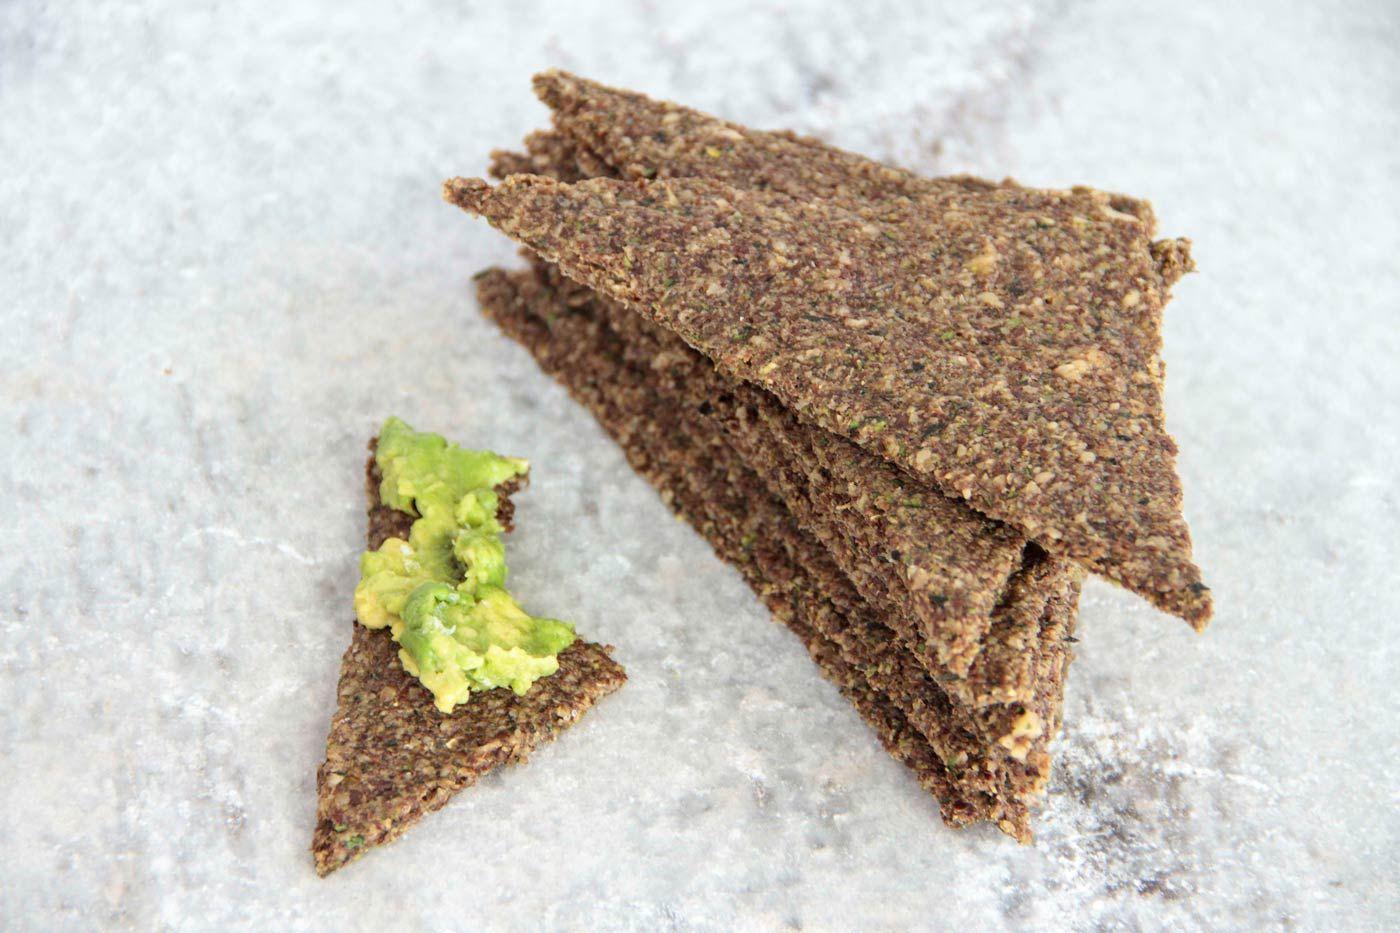 Rosemary Thyme Flax Bread 2 Dehydrator Recipes Raw Food Recipes